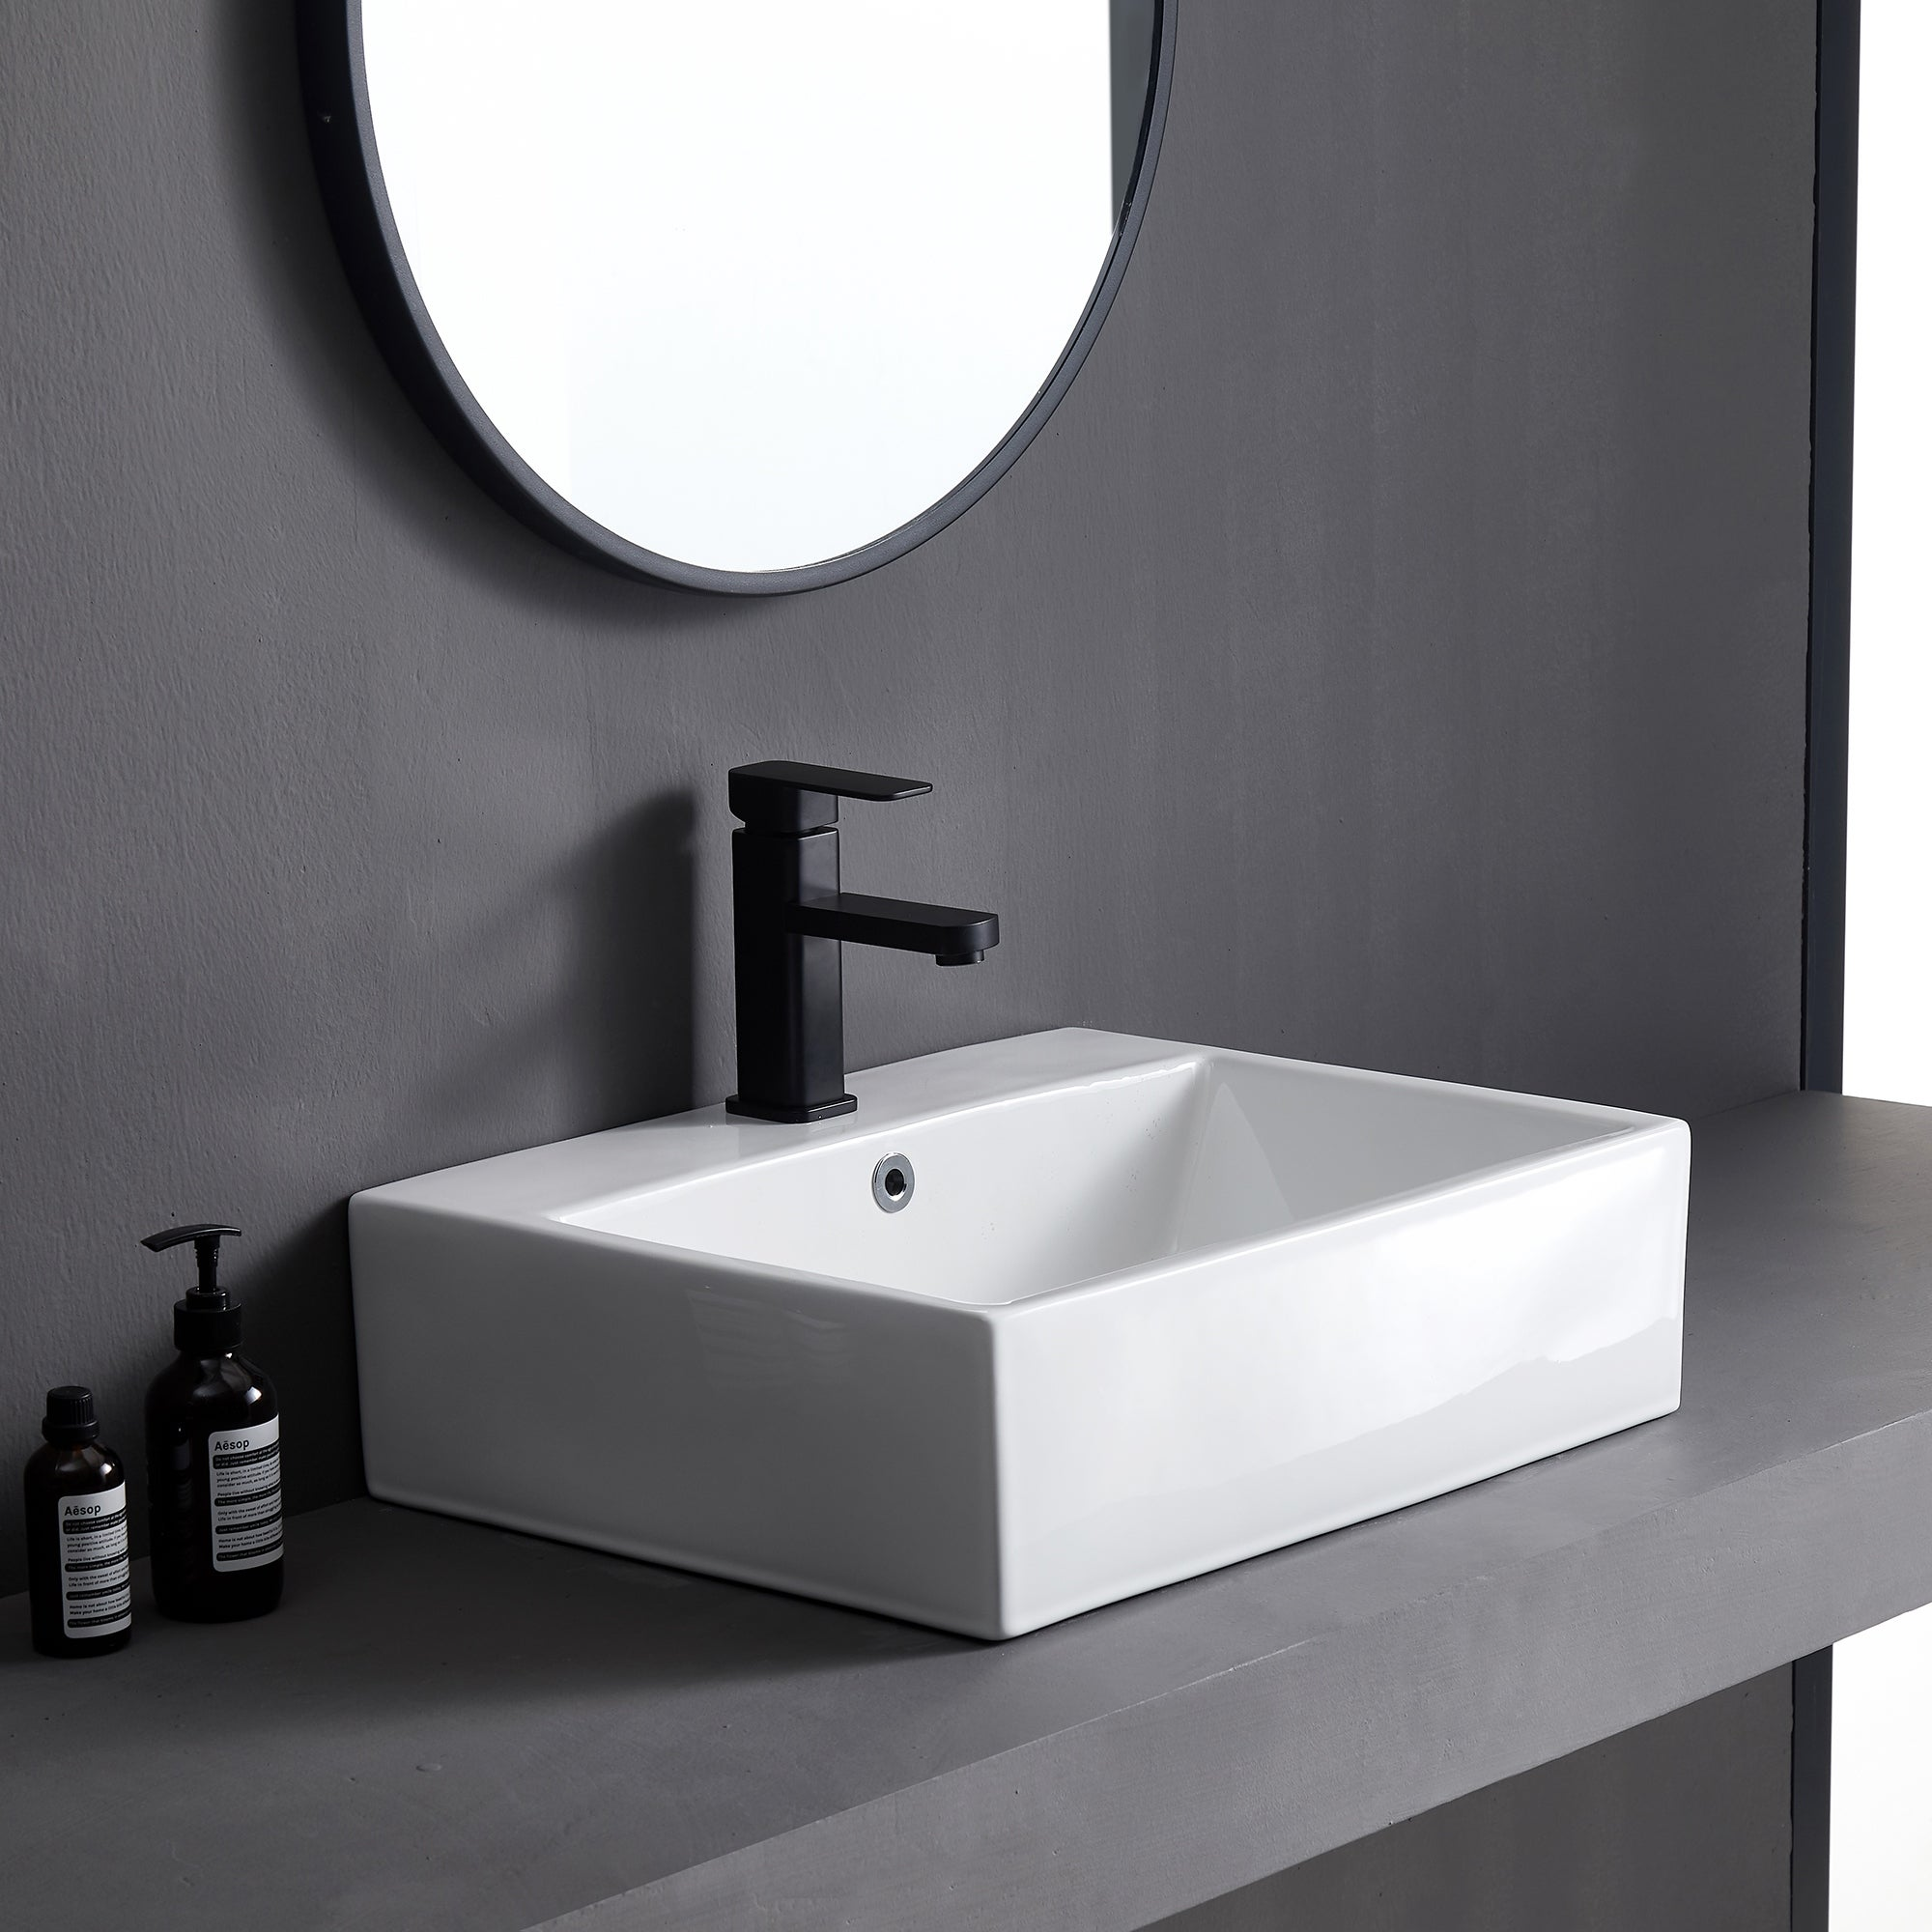 Eridanus 15 Inch Square Vessel Sink White Bathroom Sink Above Counter Ceramic Bathroom Vanity Sink Bathroom Sink Art Basin 15 X 15 Inch Tools Home Improvement Vessel Sinks Fcteutonia05 De